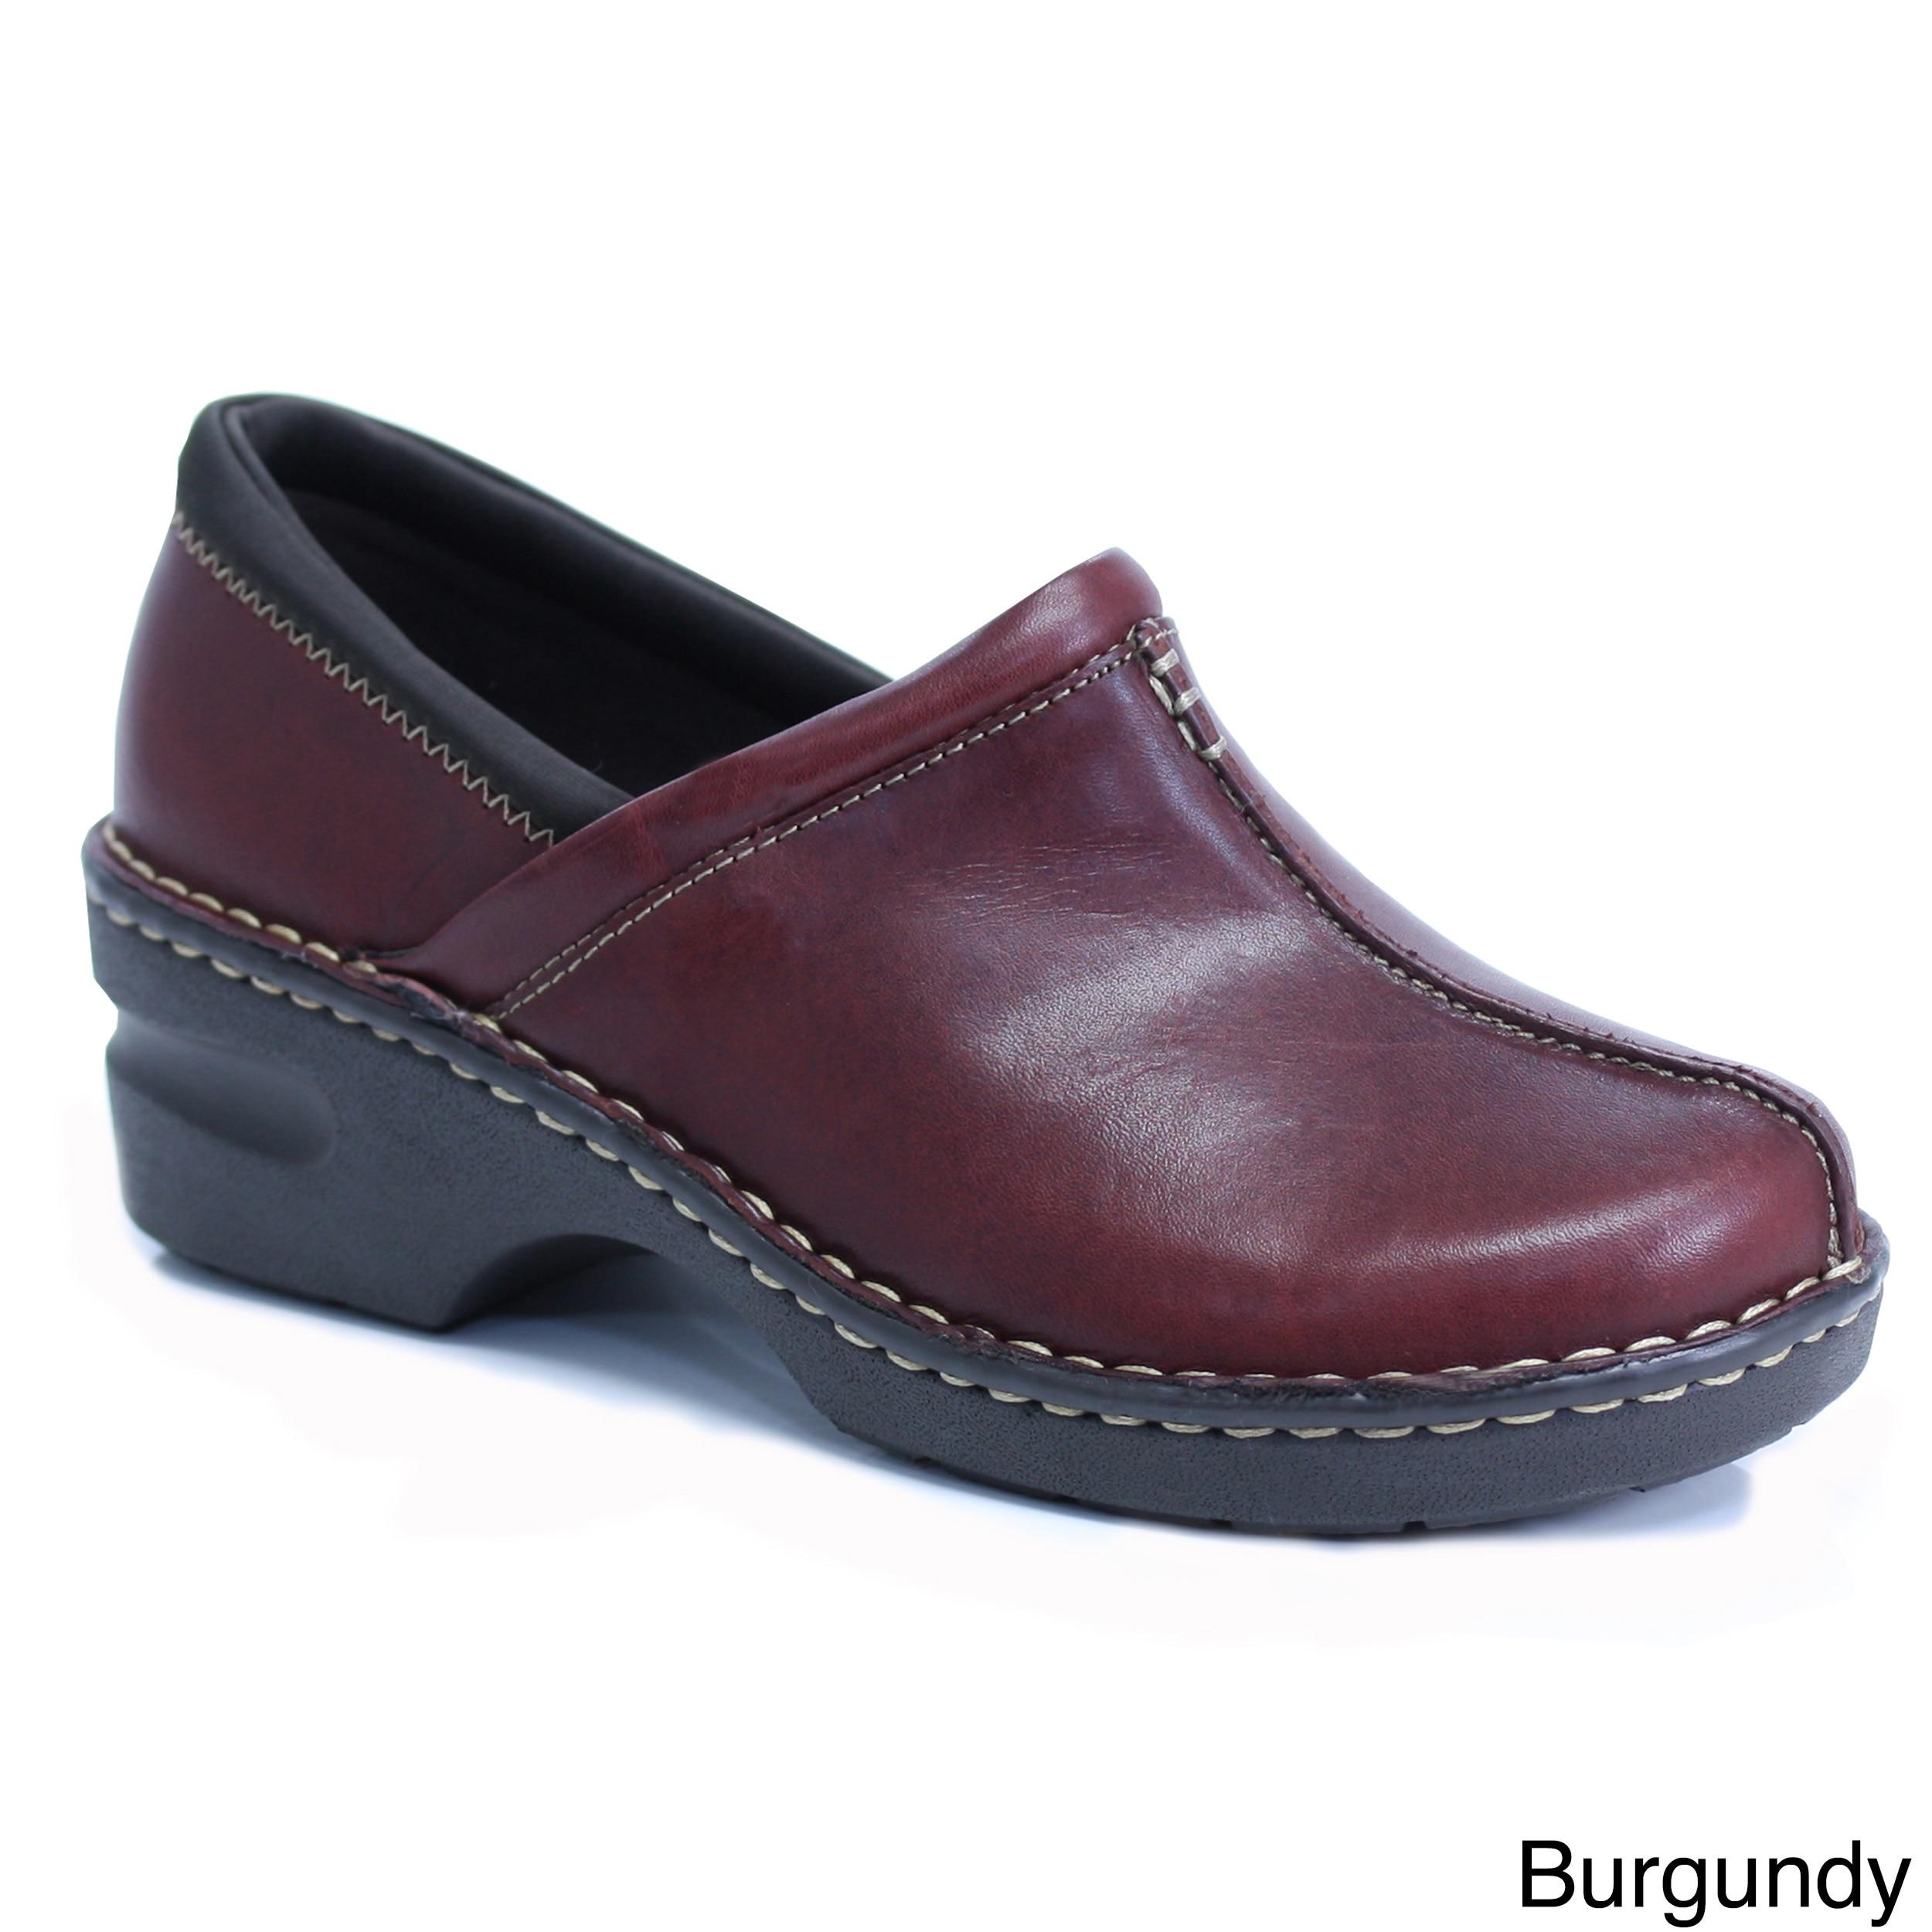 athletic ip com avia comfortable most resistant slip tactic walmart comforter shoes s men